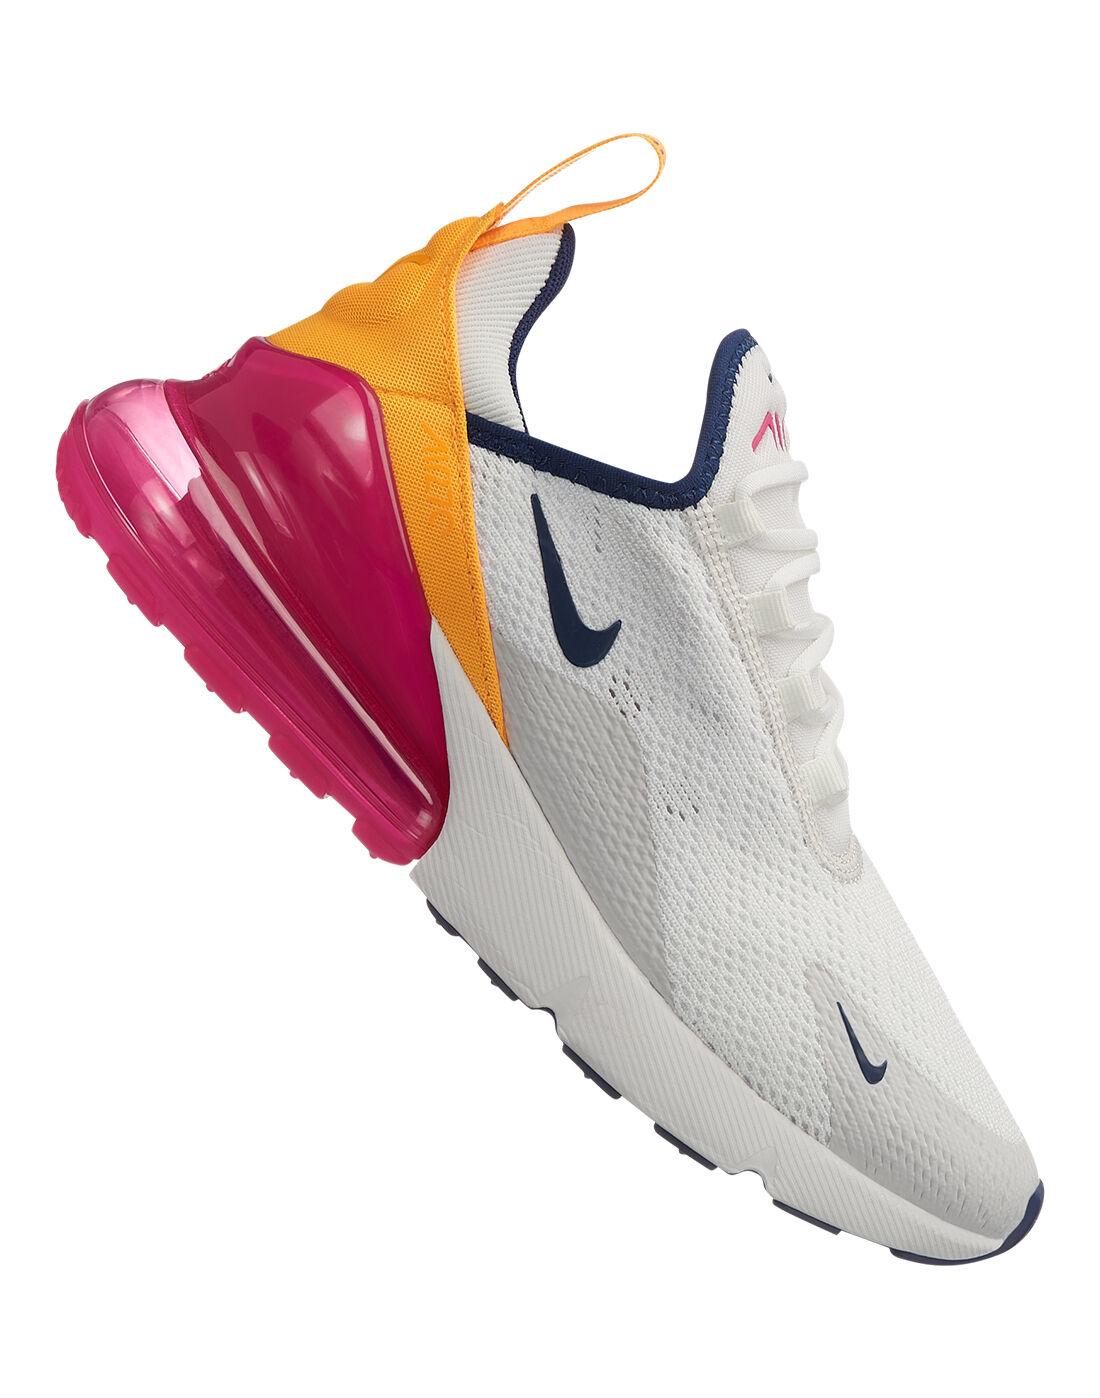 Women's Pink \u0026 White Nike Air Max 270